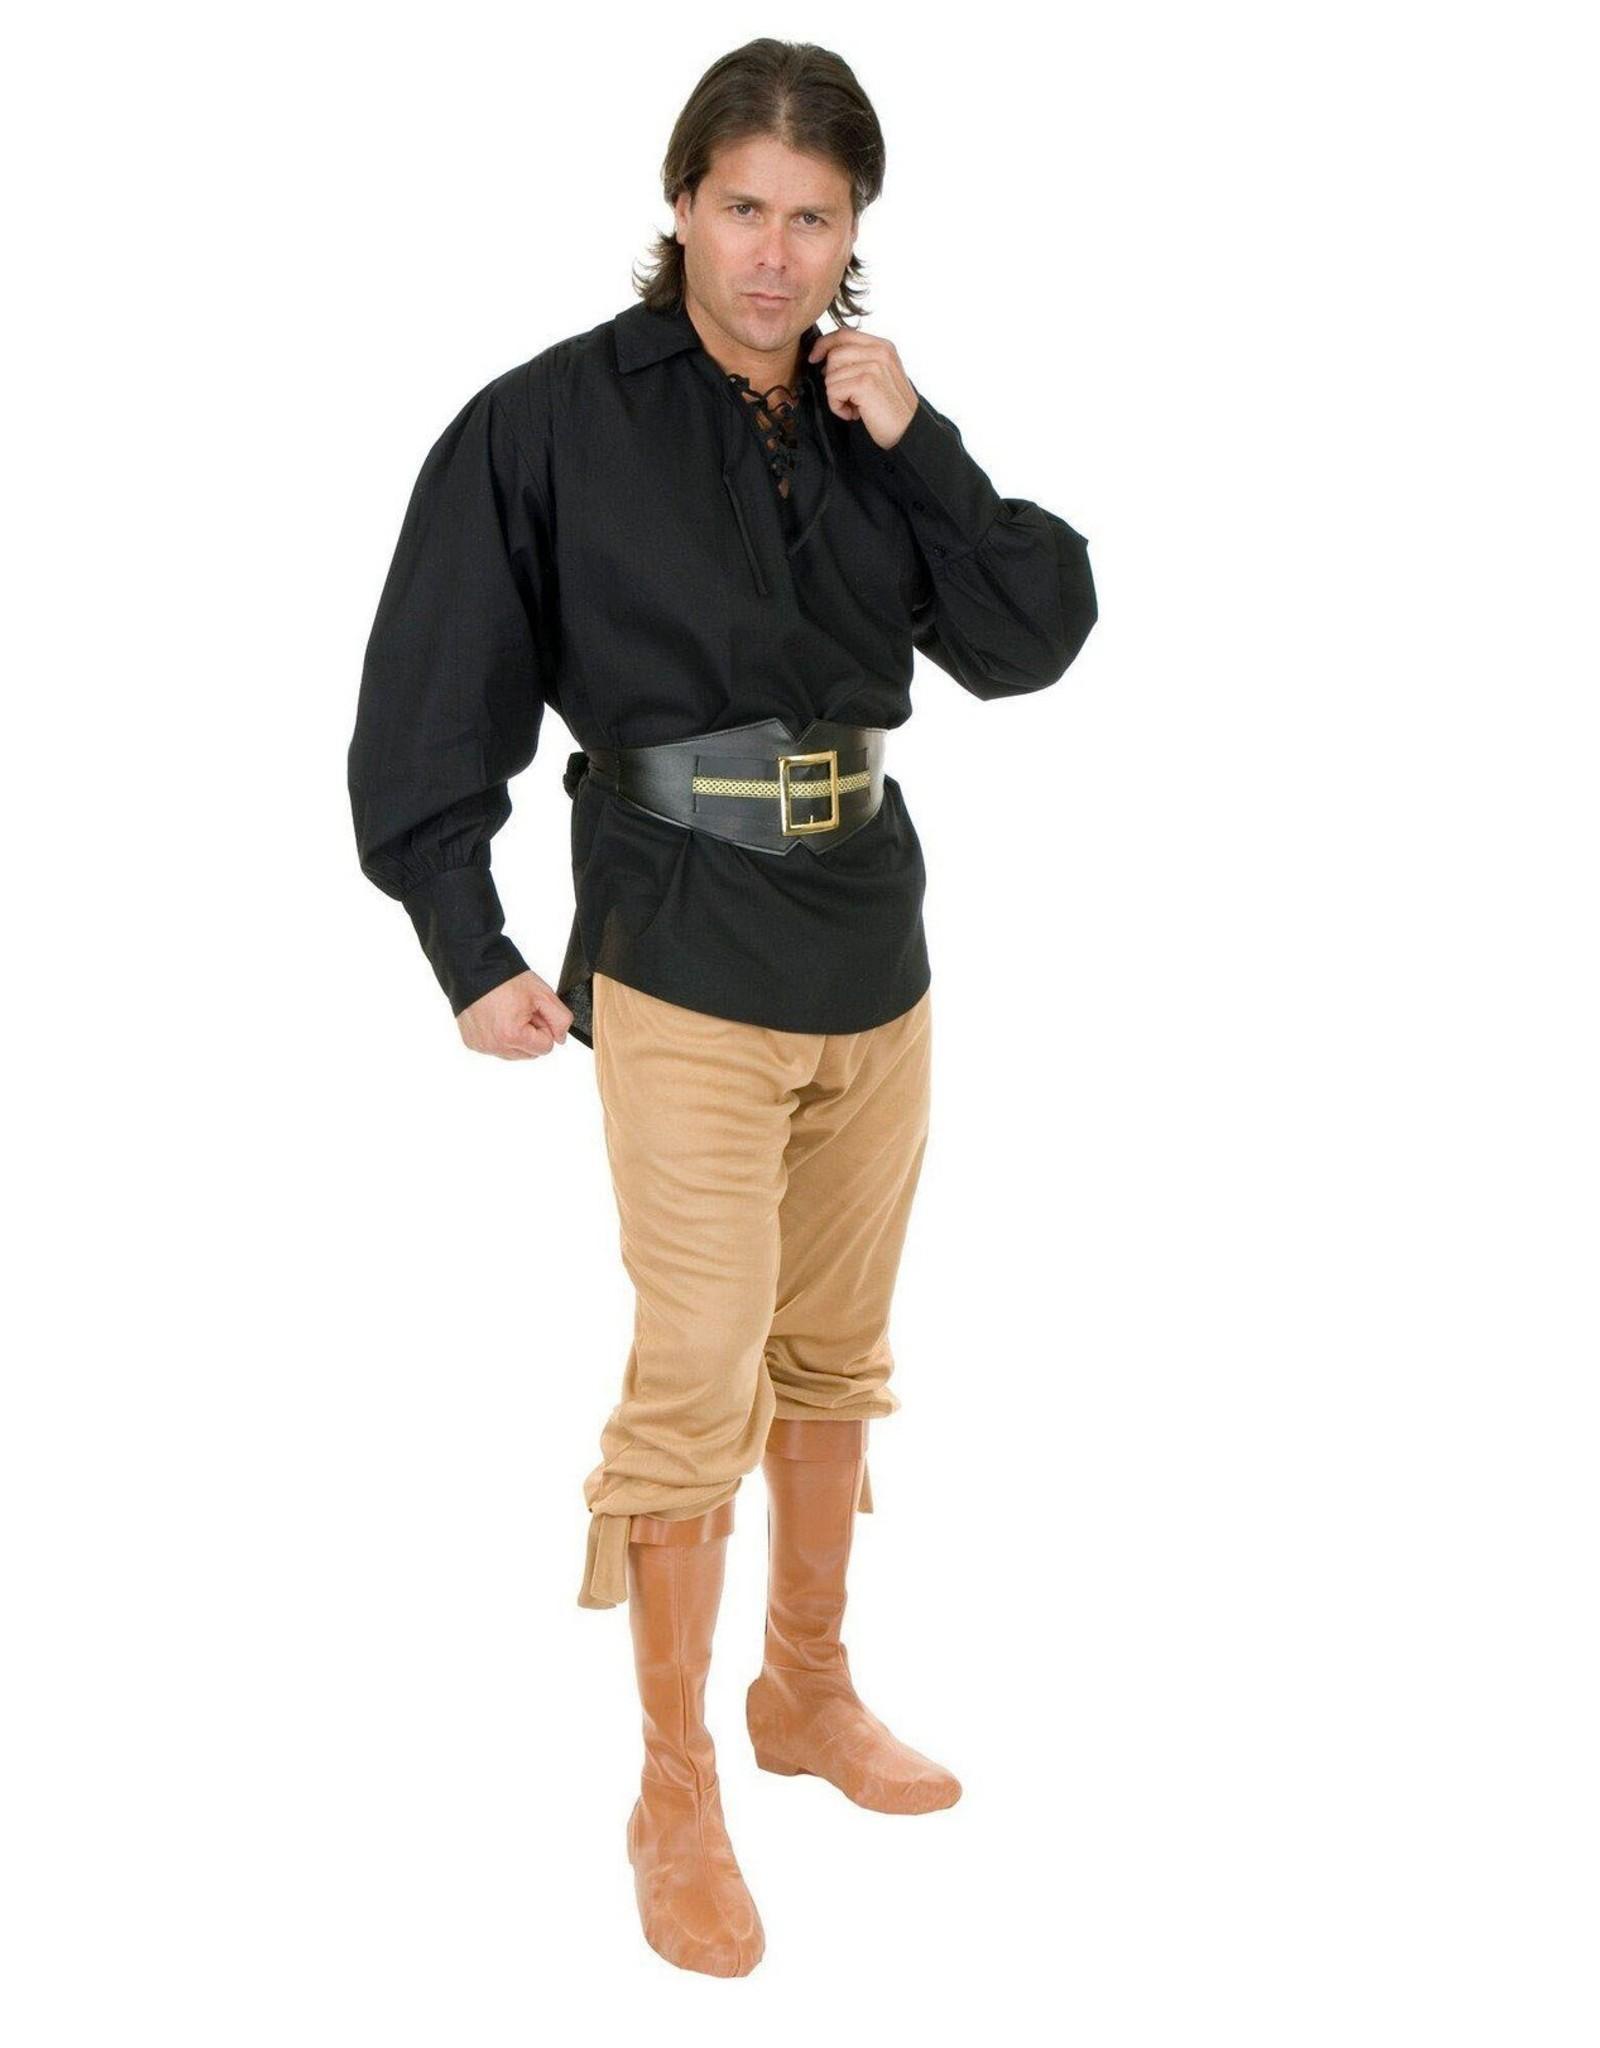 Charades Pirate Shirt Black